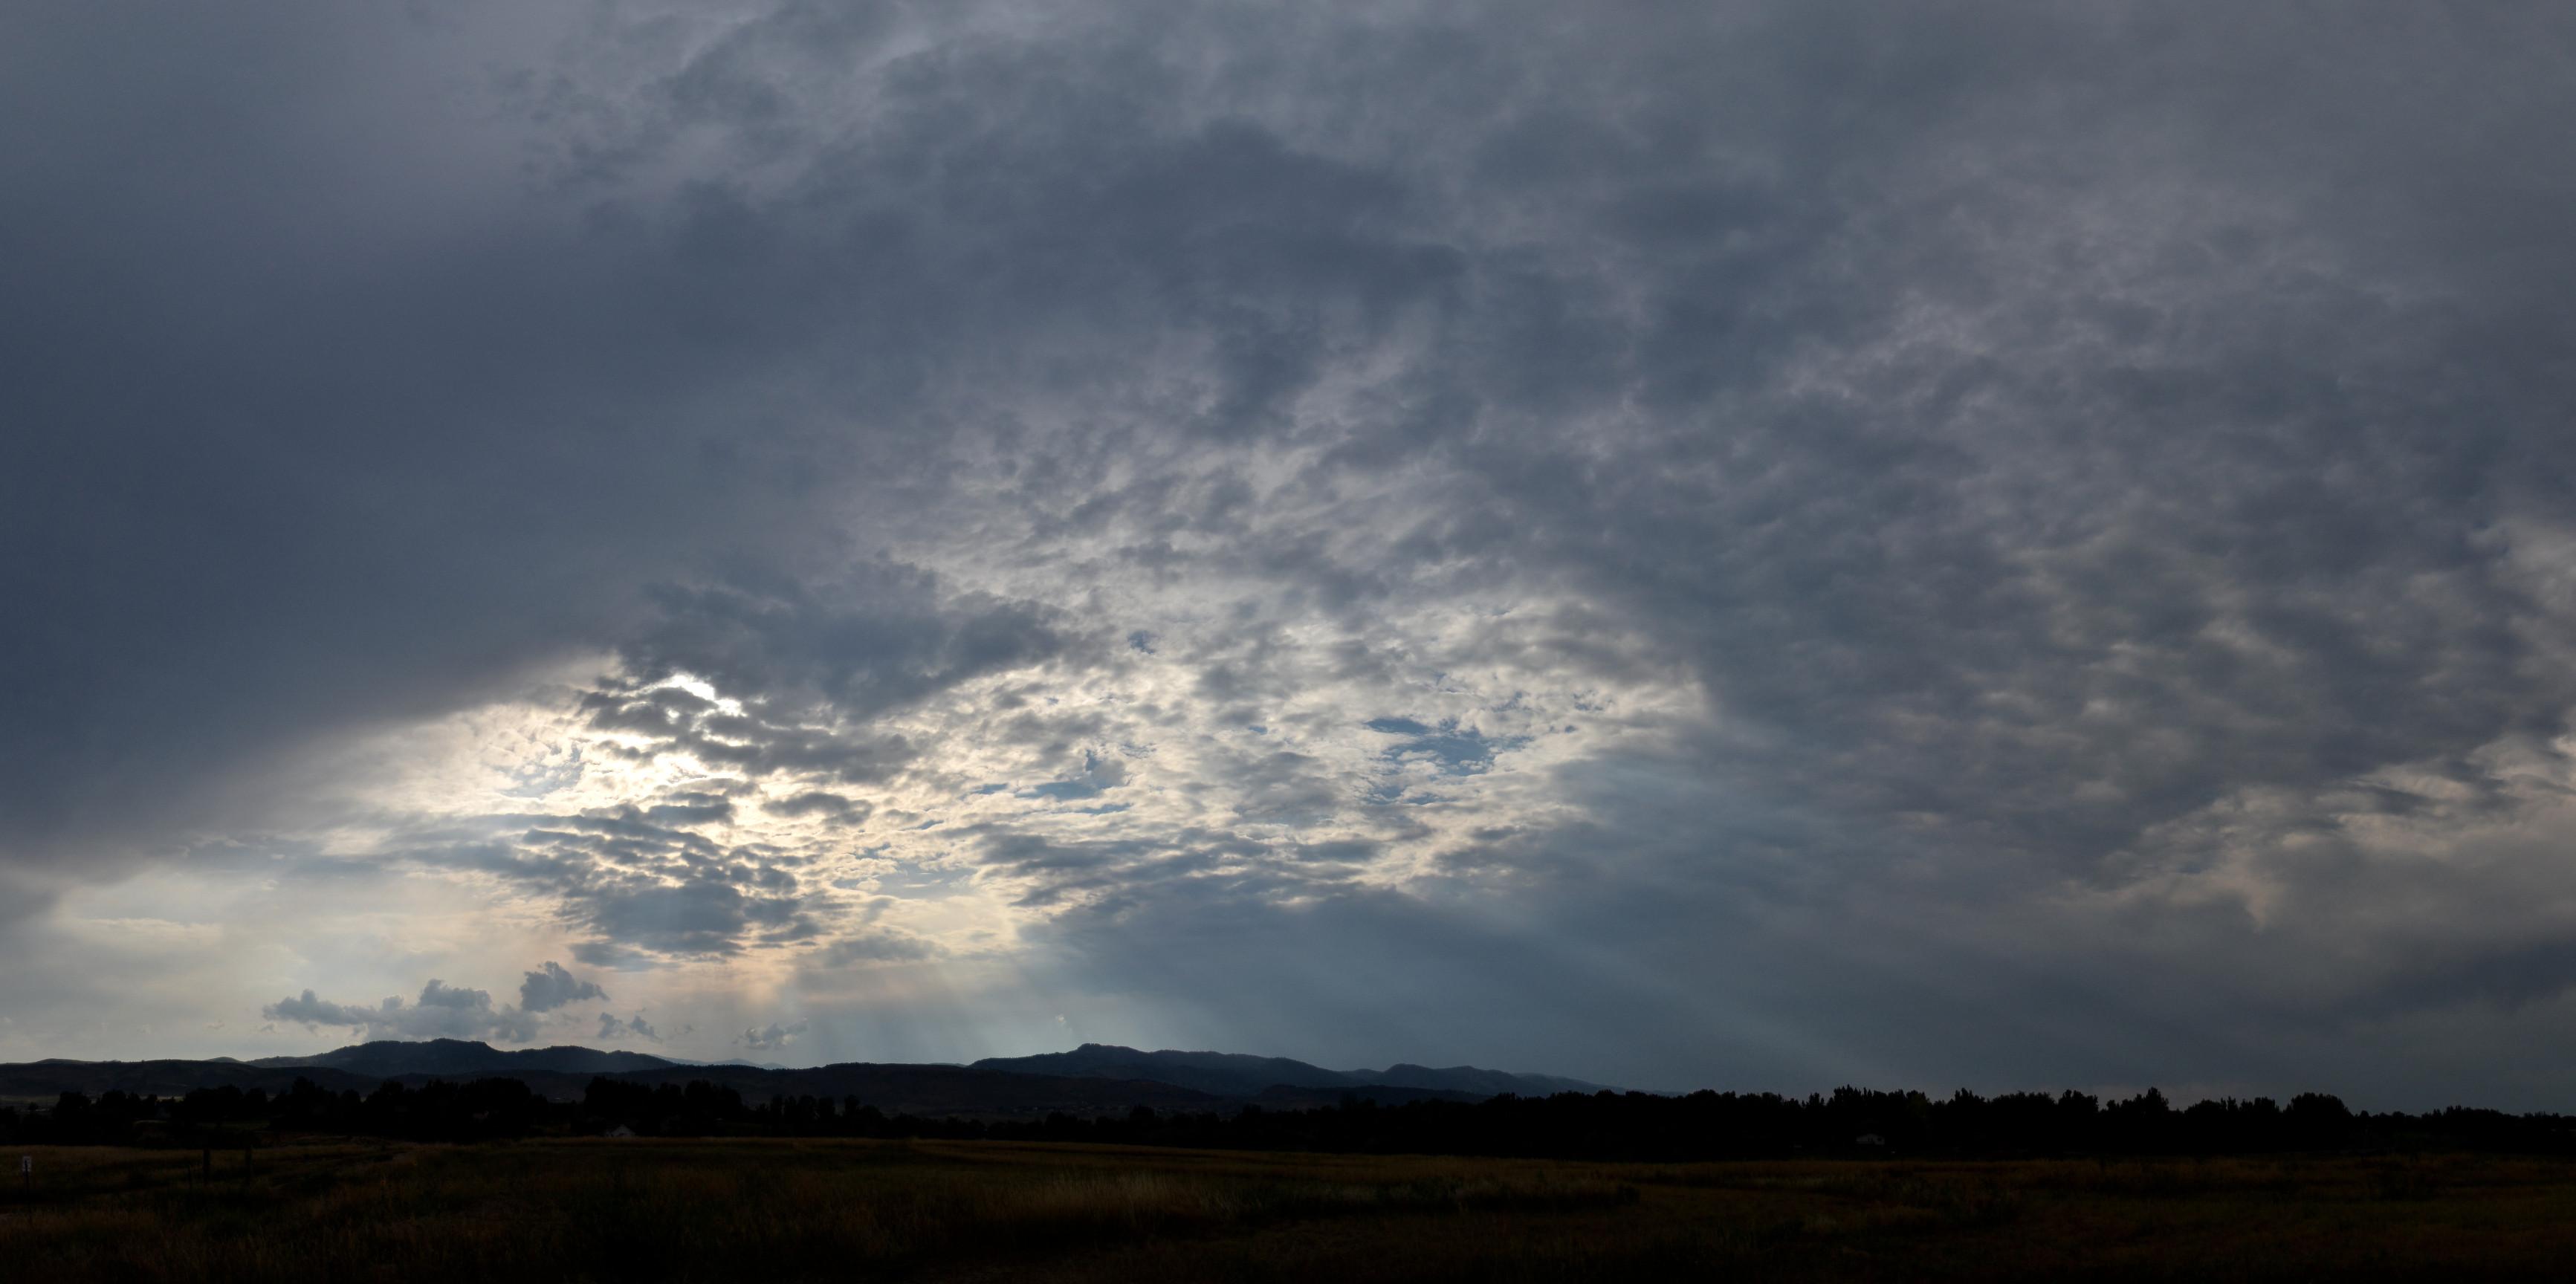 Stormy Backlit Panoramic Clouds  U0026 Distant Cumulus Clouds